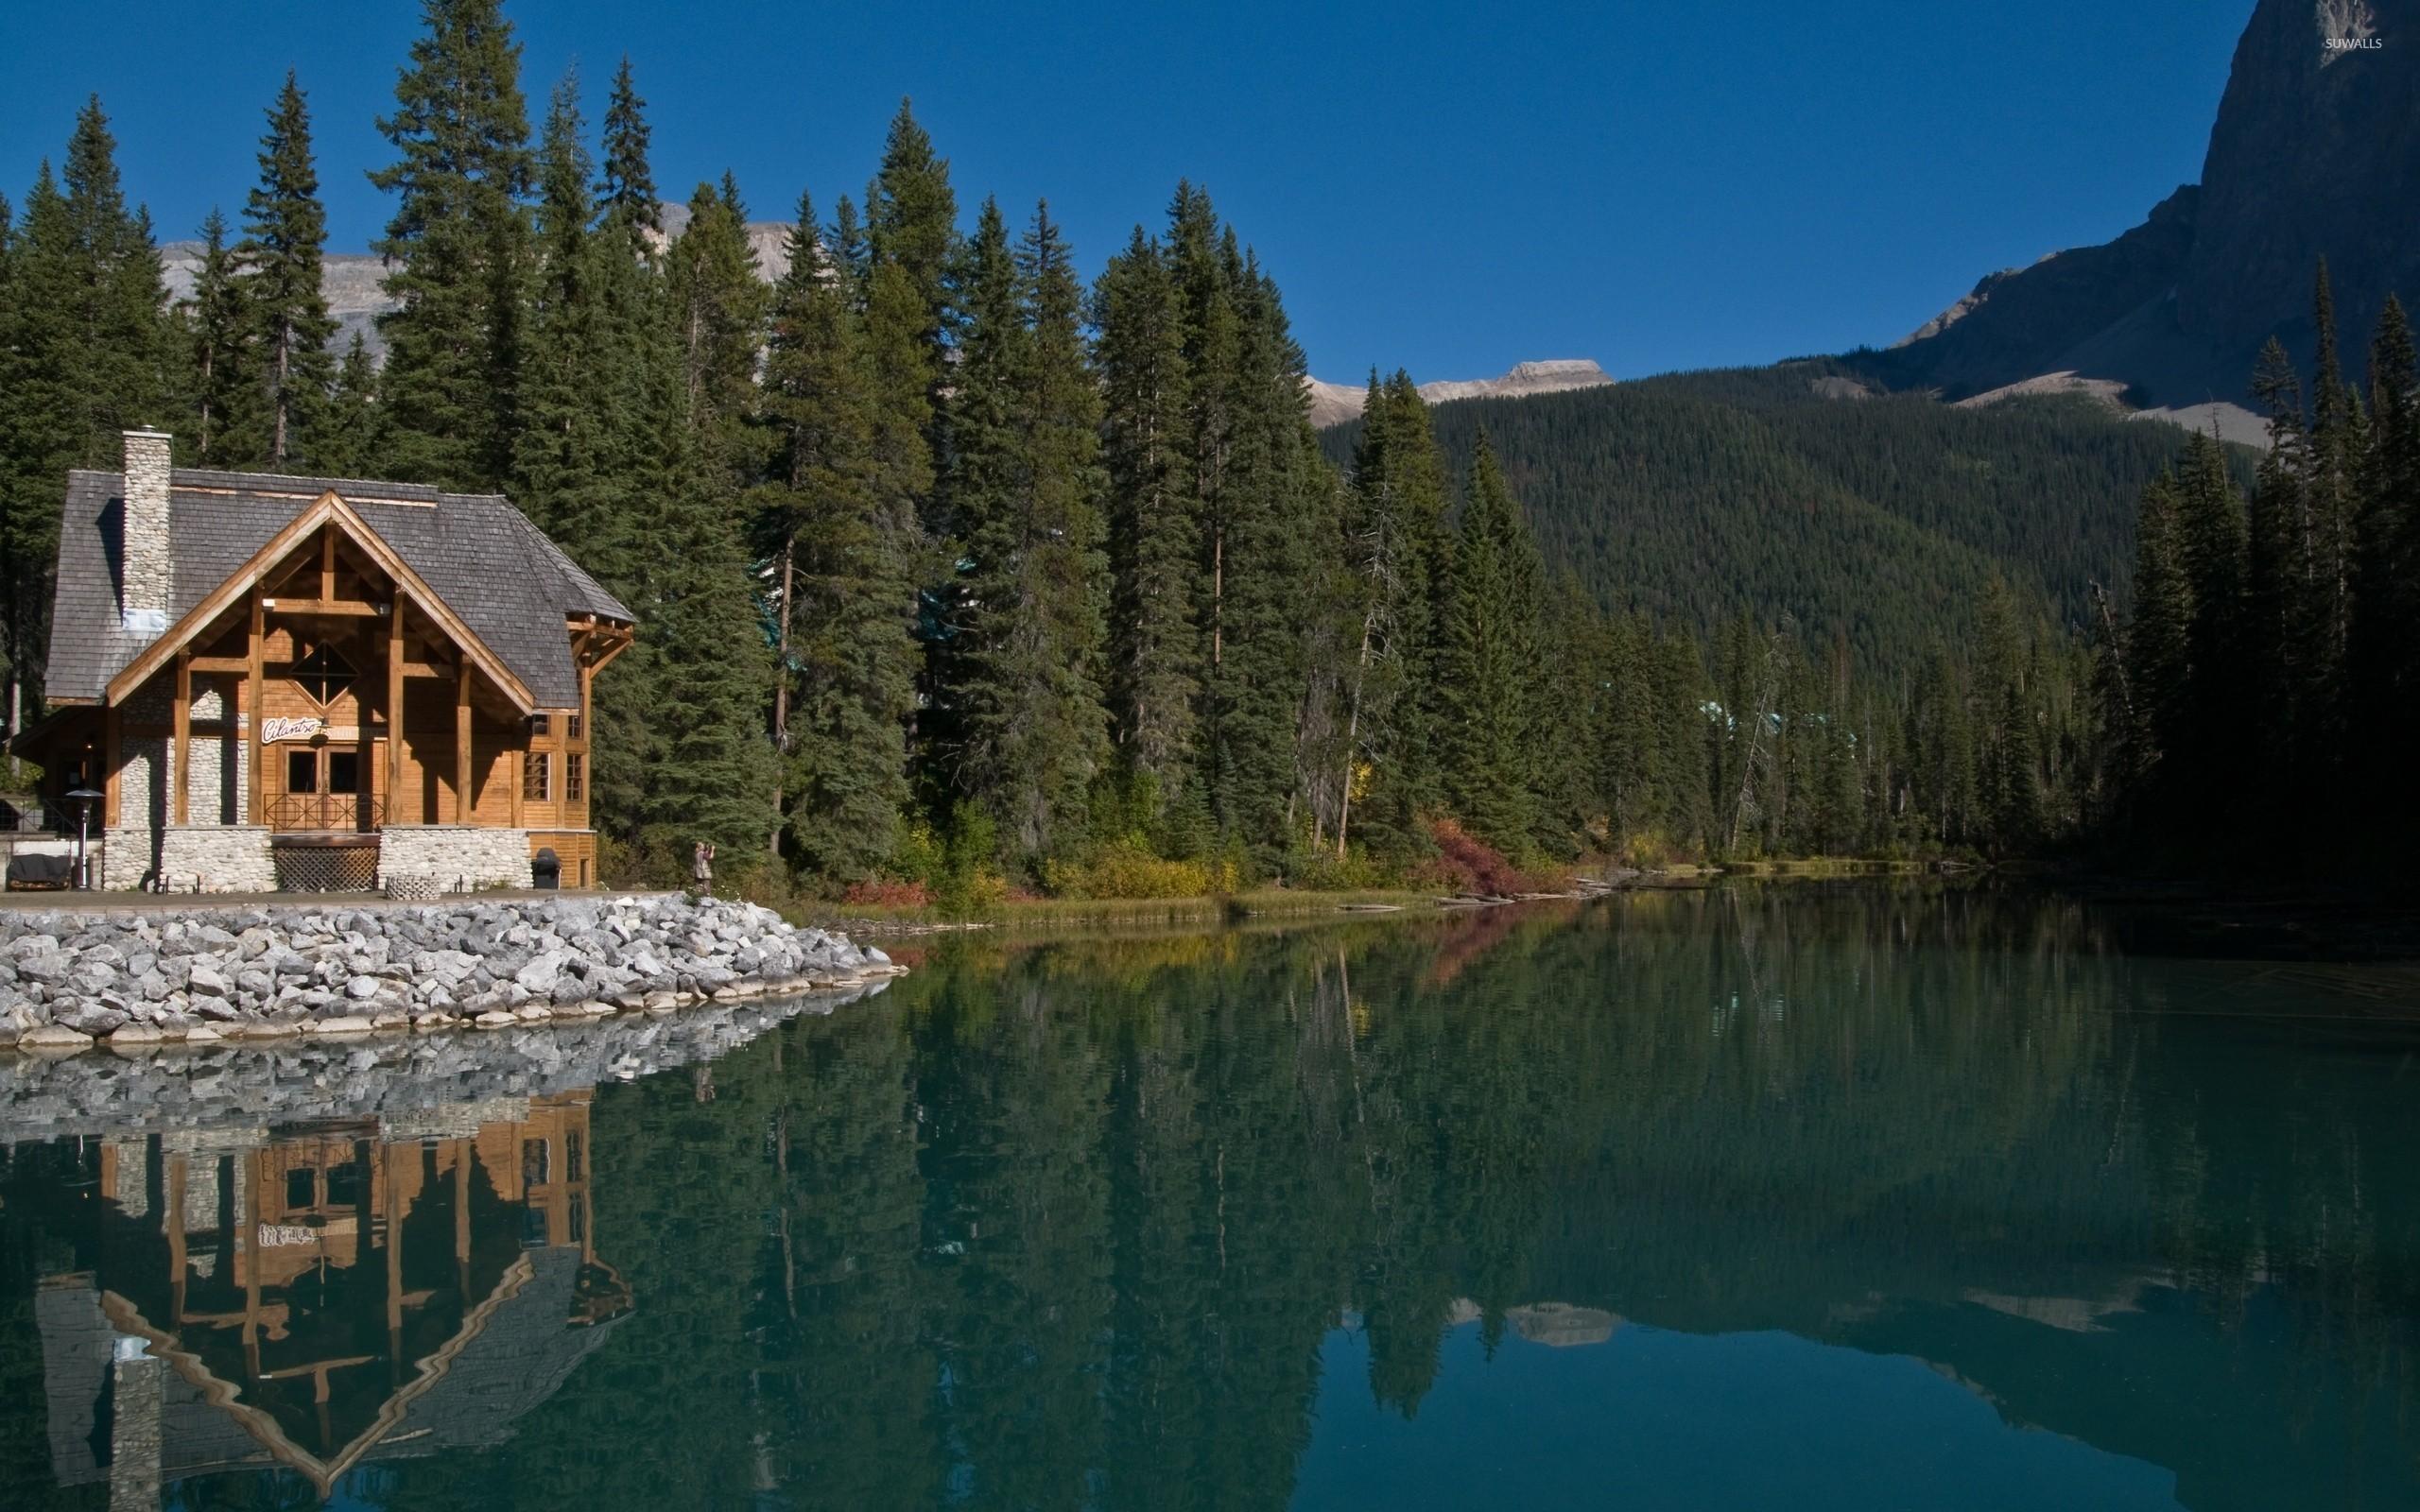 Haus am see wallpaper  Hut at the mountain lake wallpaper - Nature wallpapers - #44508